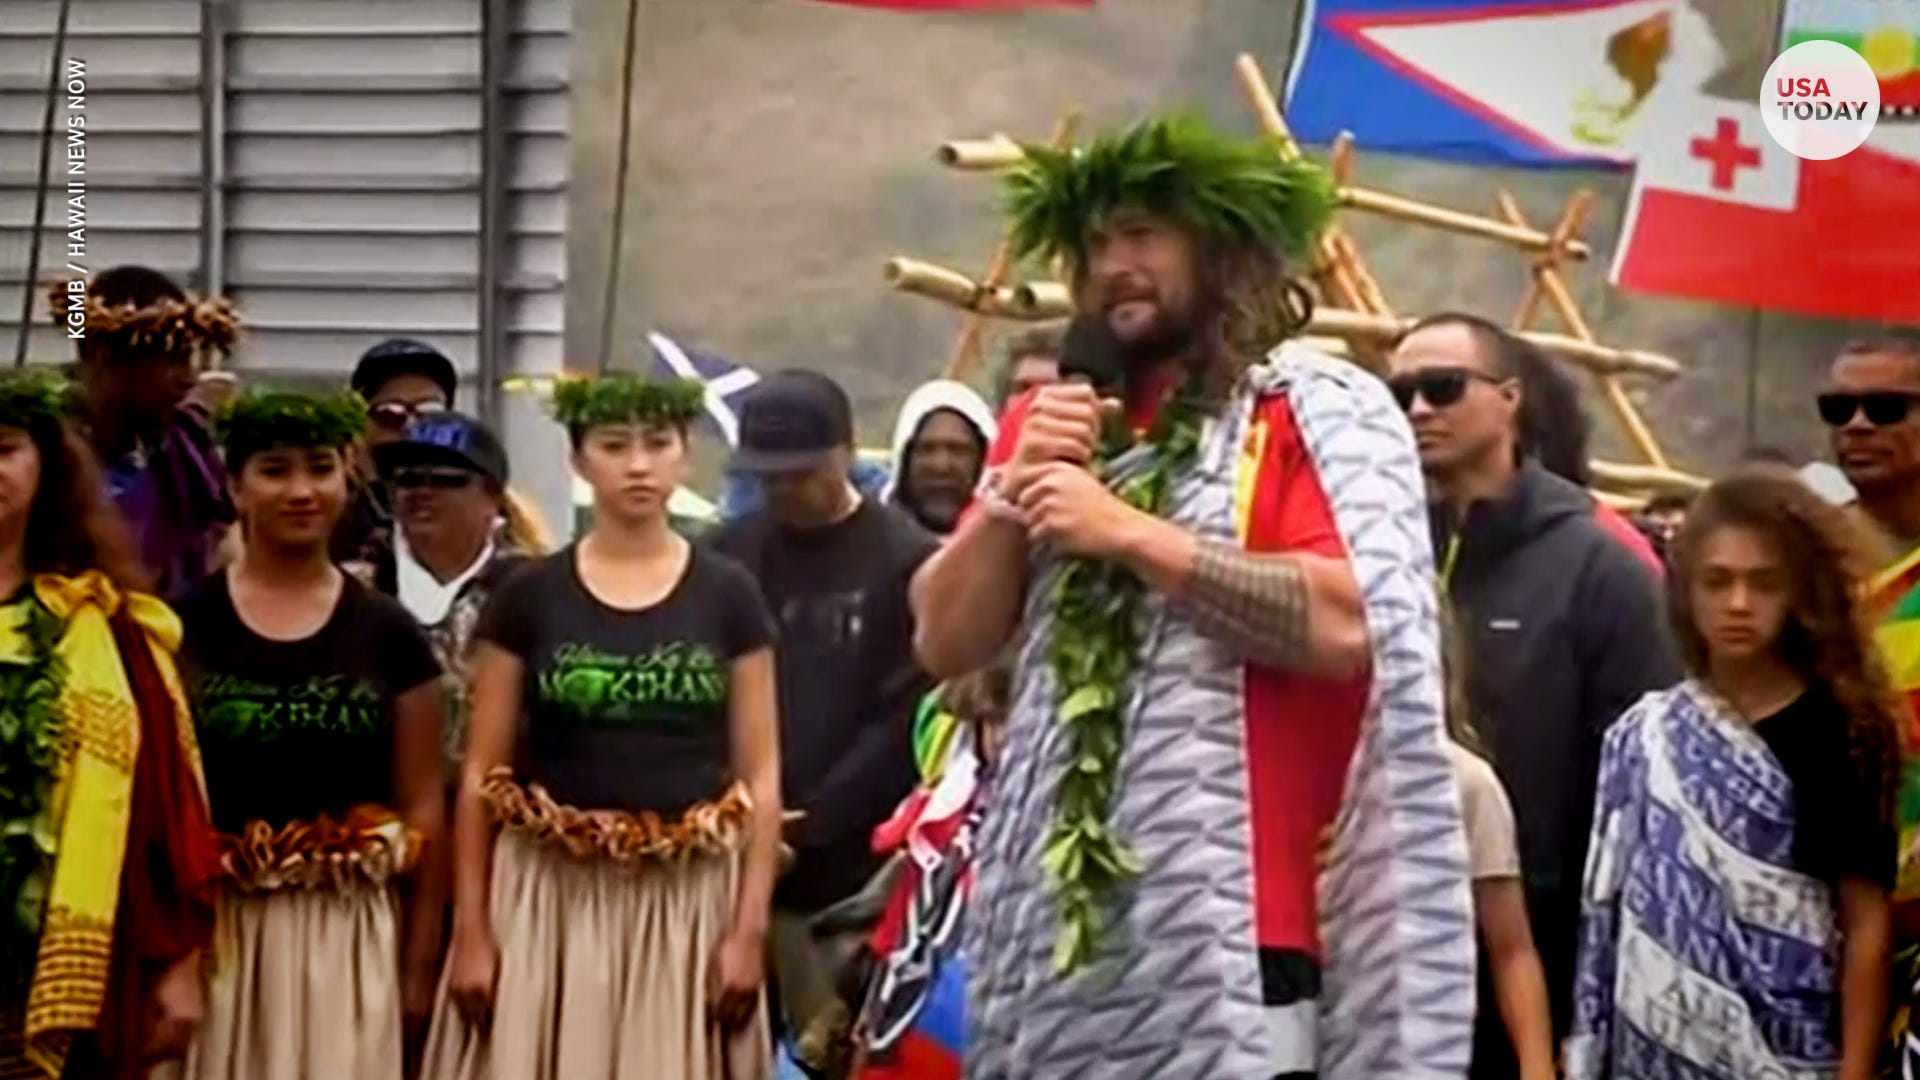 Iowan actor Jason Momoa has spent his summer protesting construction of telescope in Hawaii